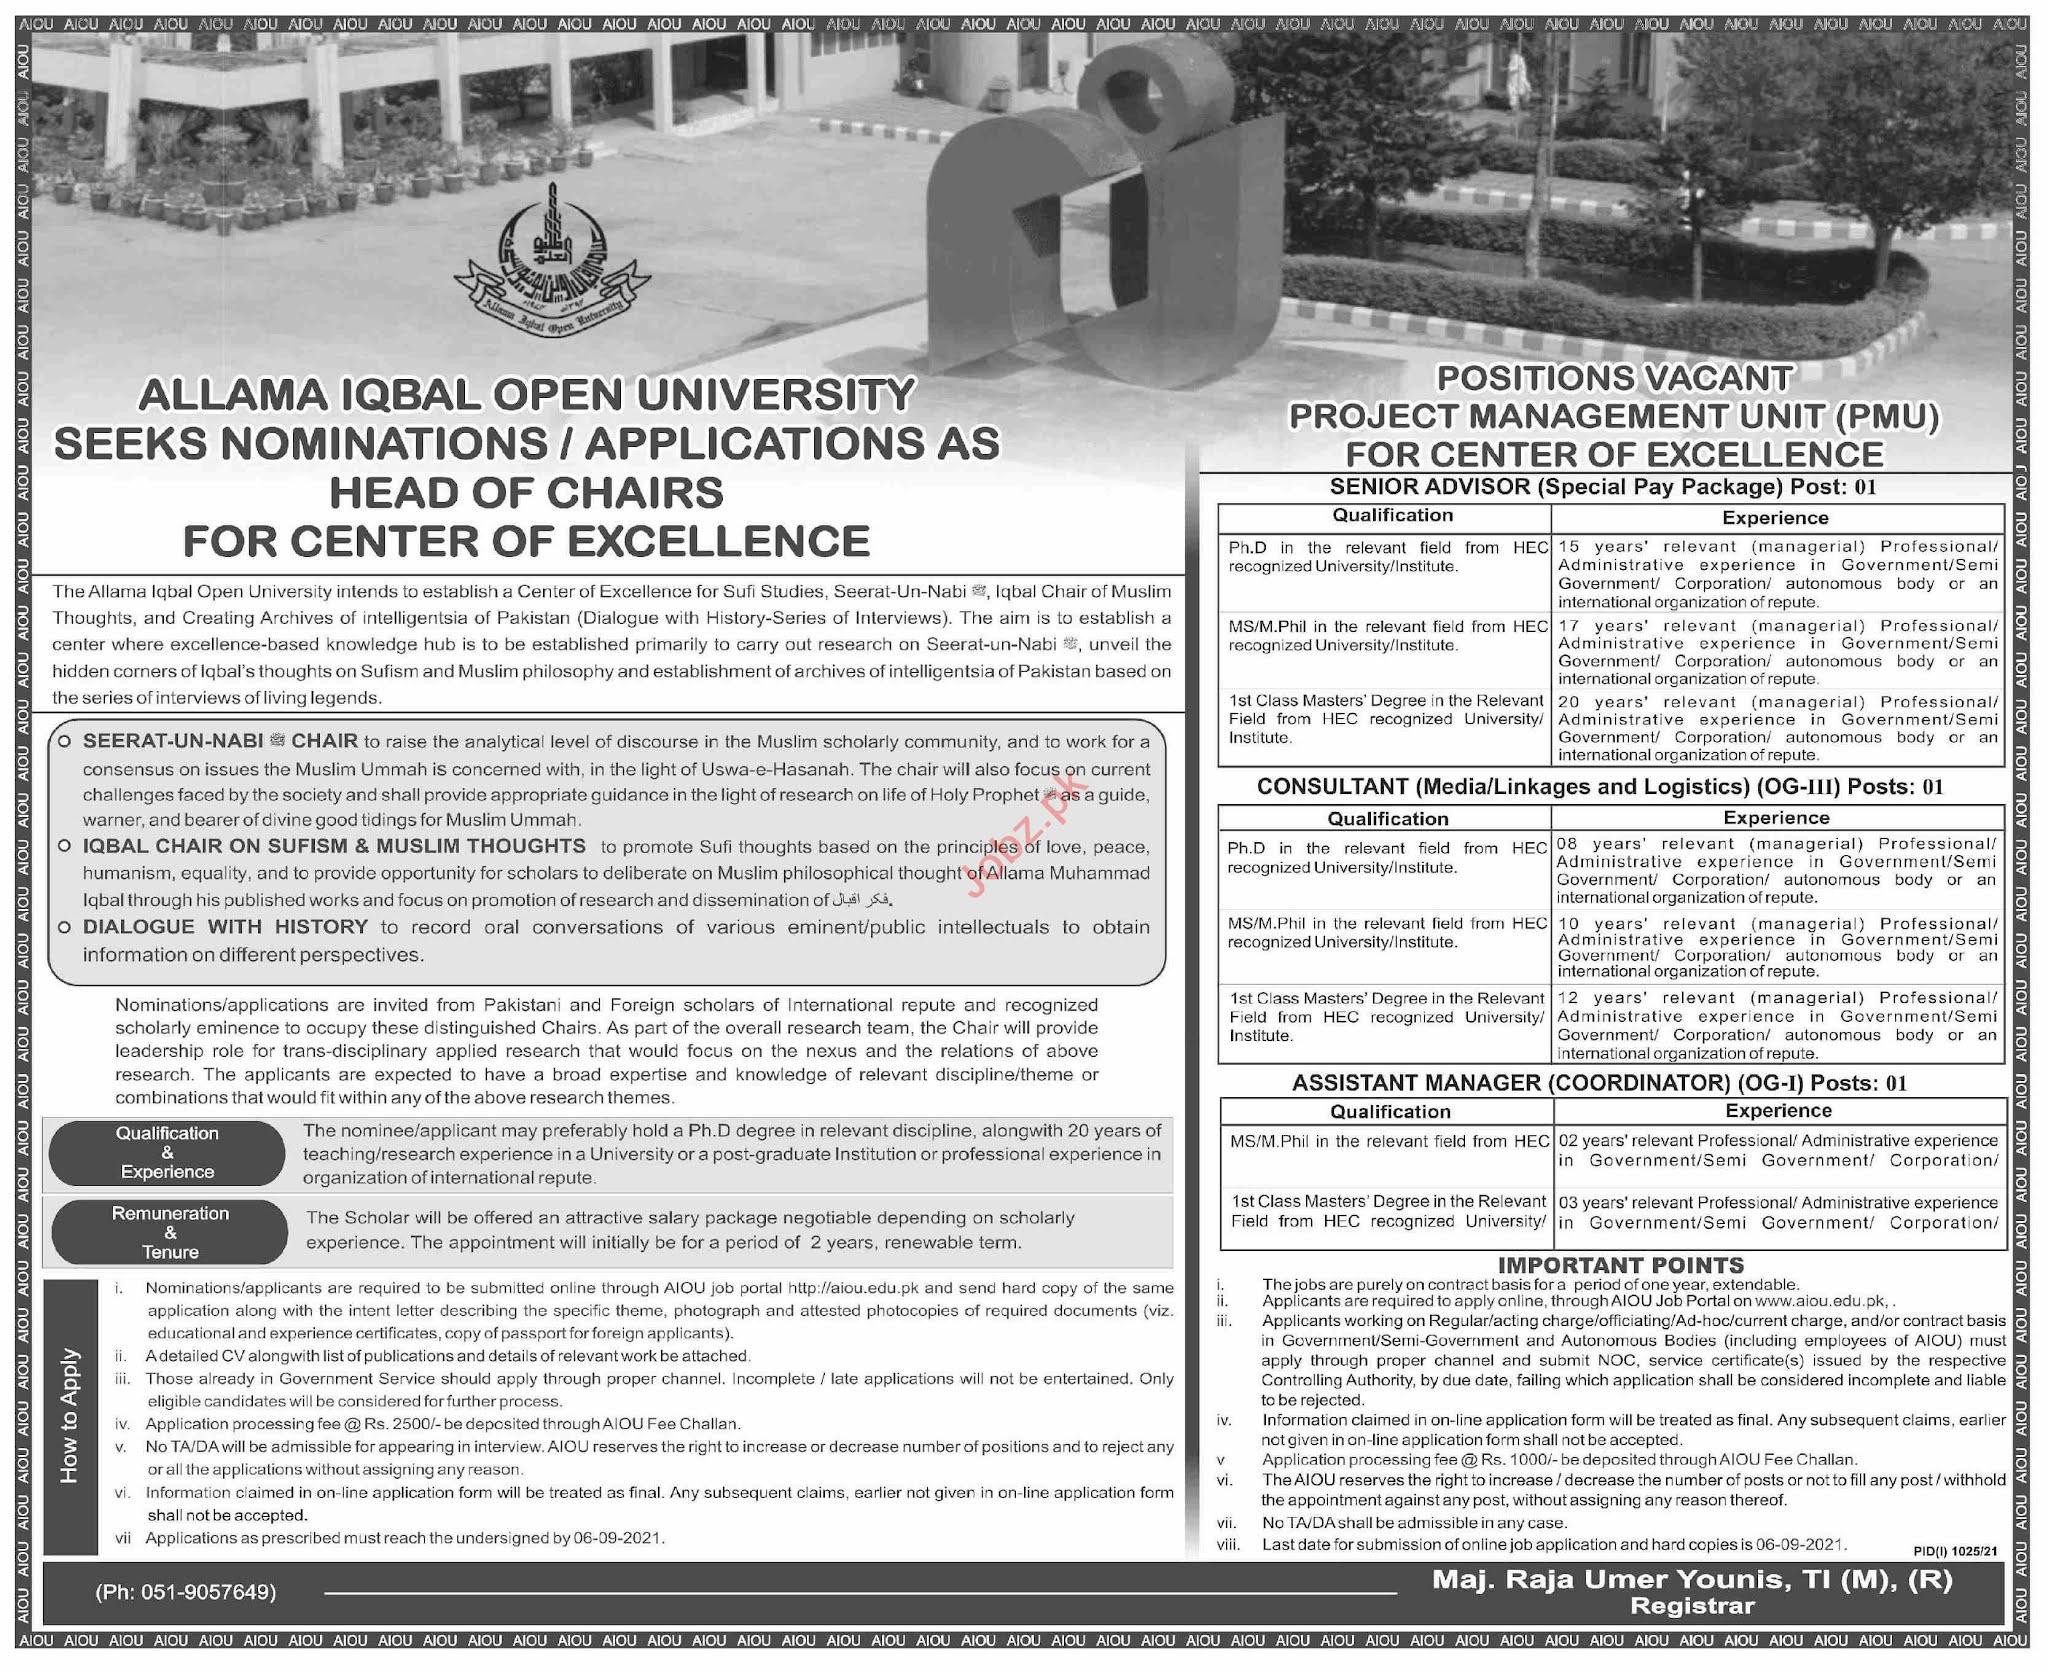 Allama Iqbal Open University AIOU Jobs 2021 in Pakistan